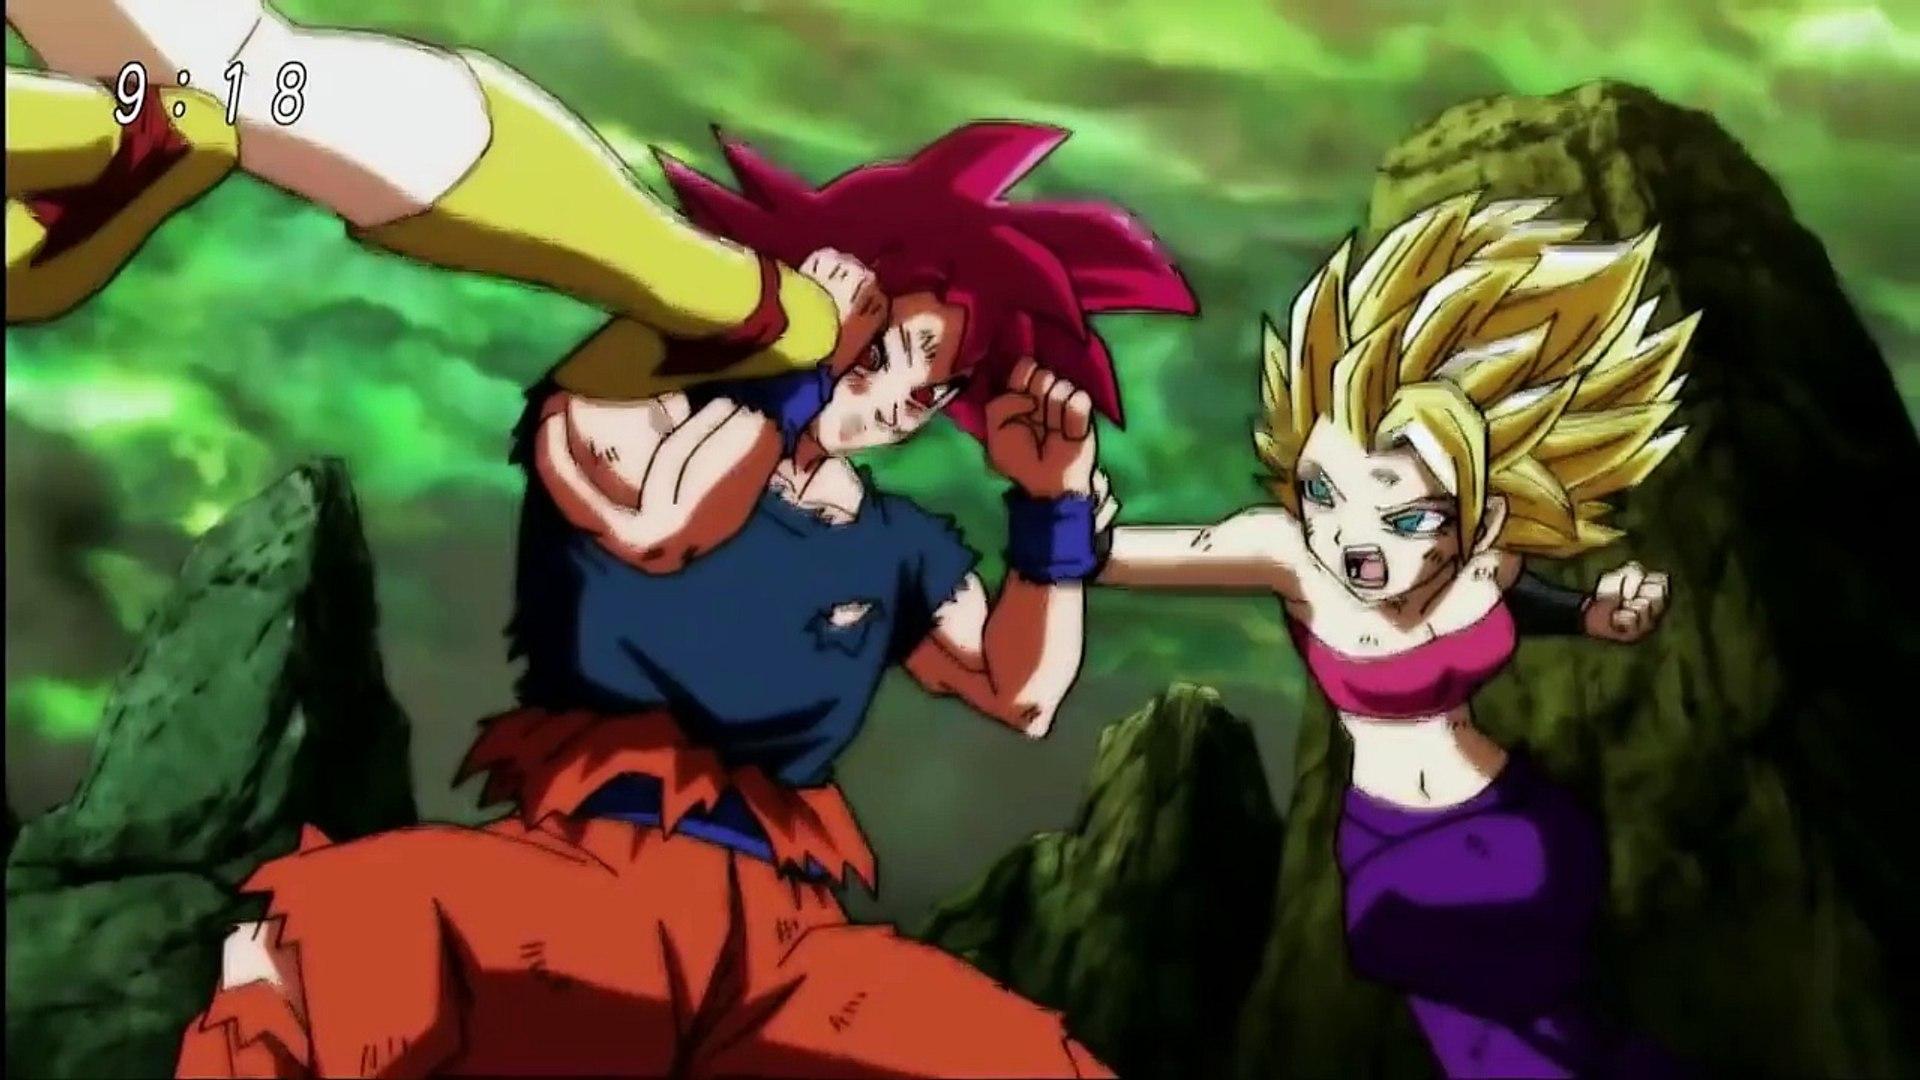 Super Saiyan God Goku Vs Caulifla Kale Dragon Ball Super Episode